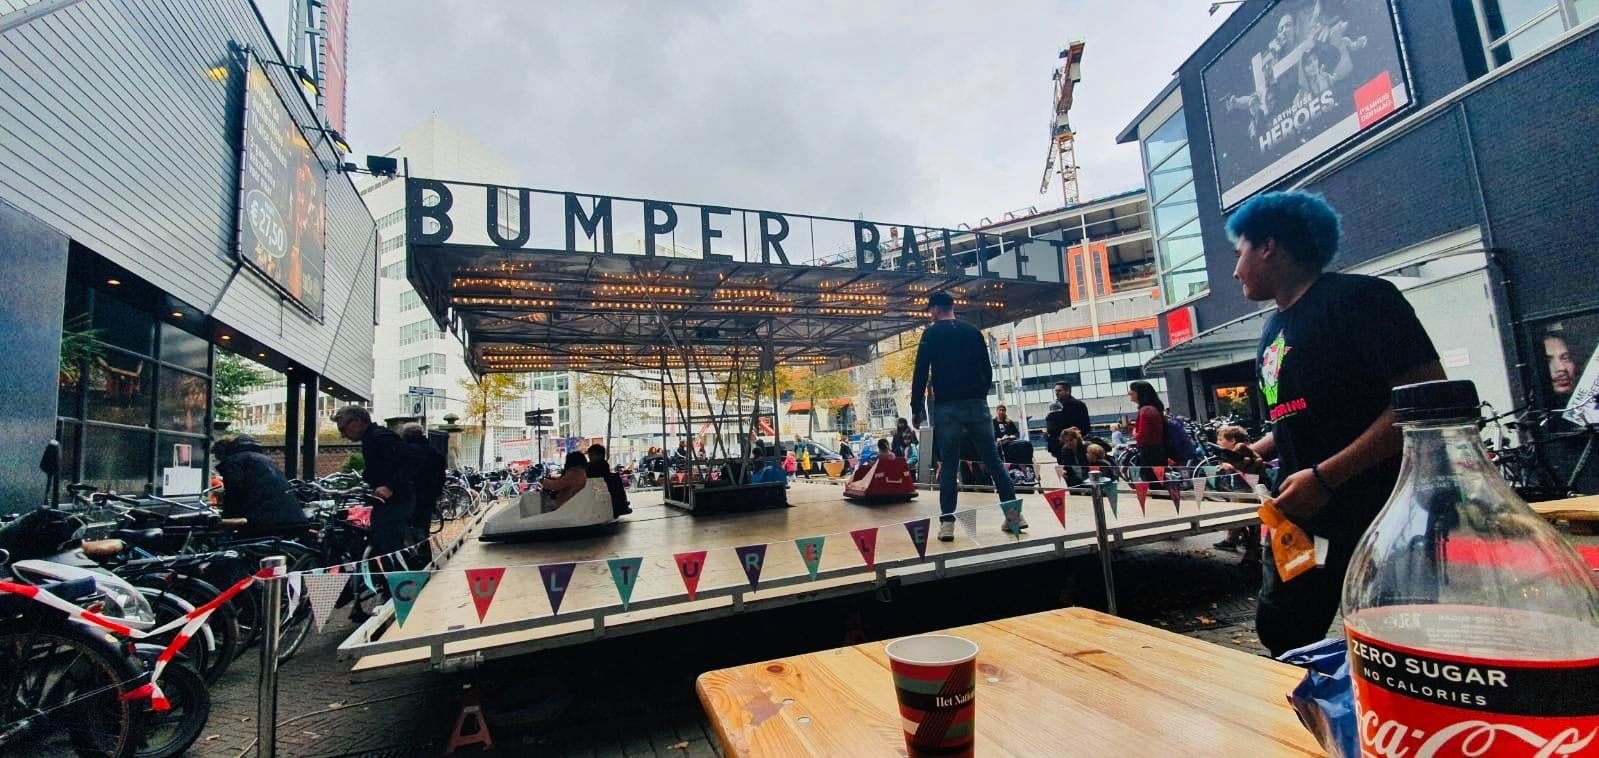 Bumper Ballet at De Betovering 2019